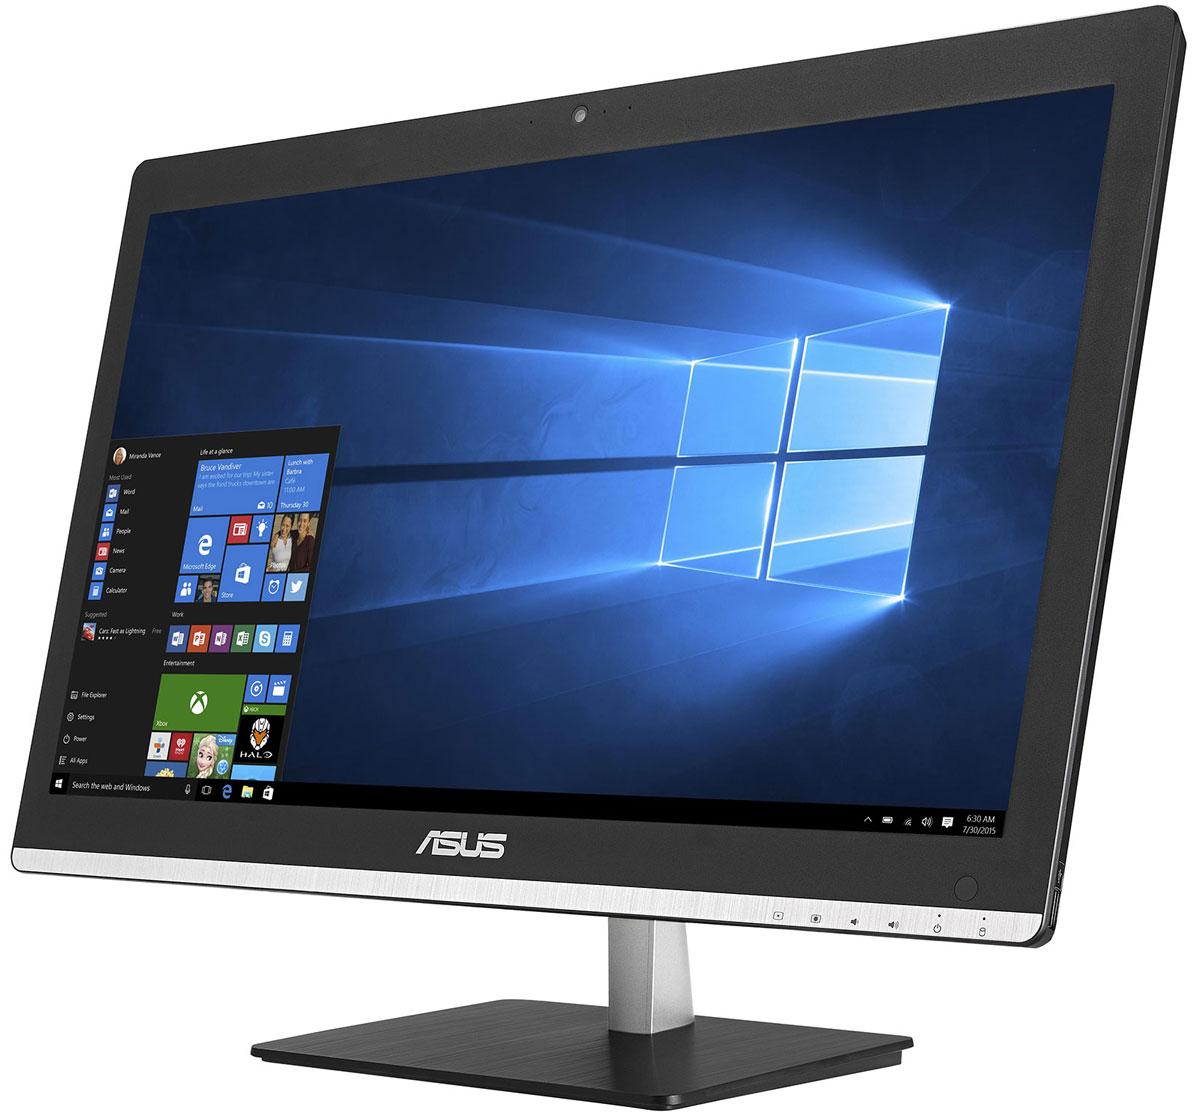 Asus Vivo AiO V220IBUK, Black моноблок (V220IBUK-BC080X)